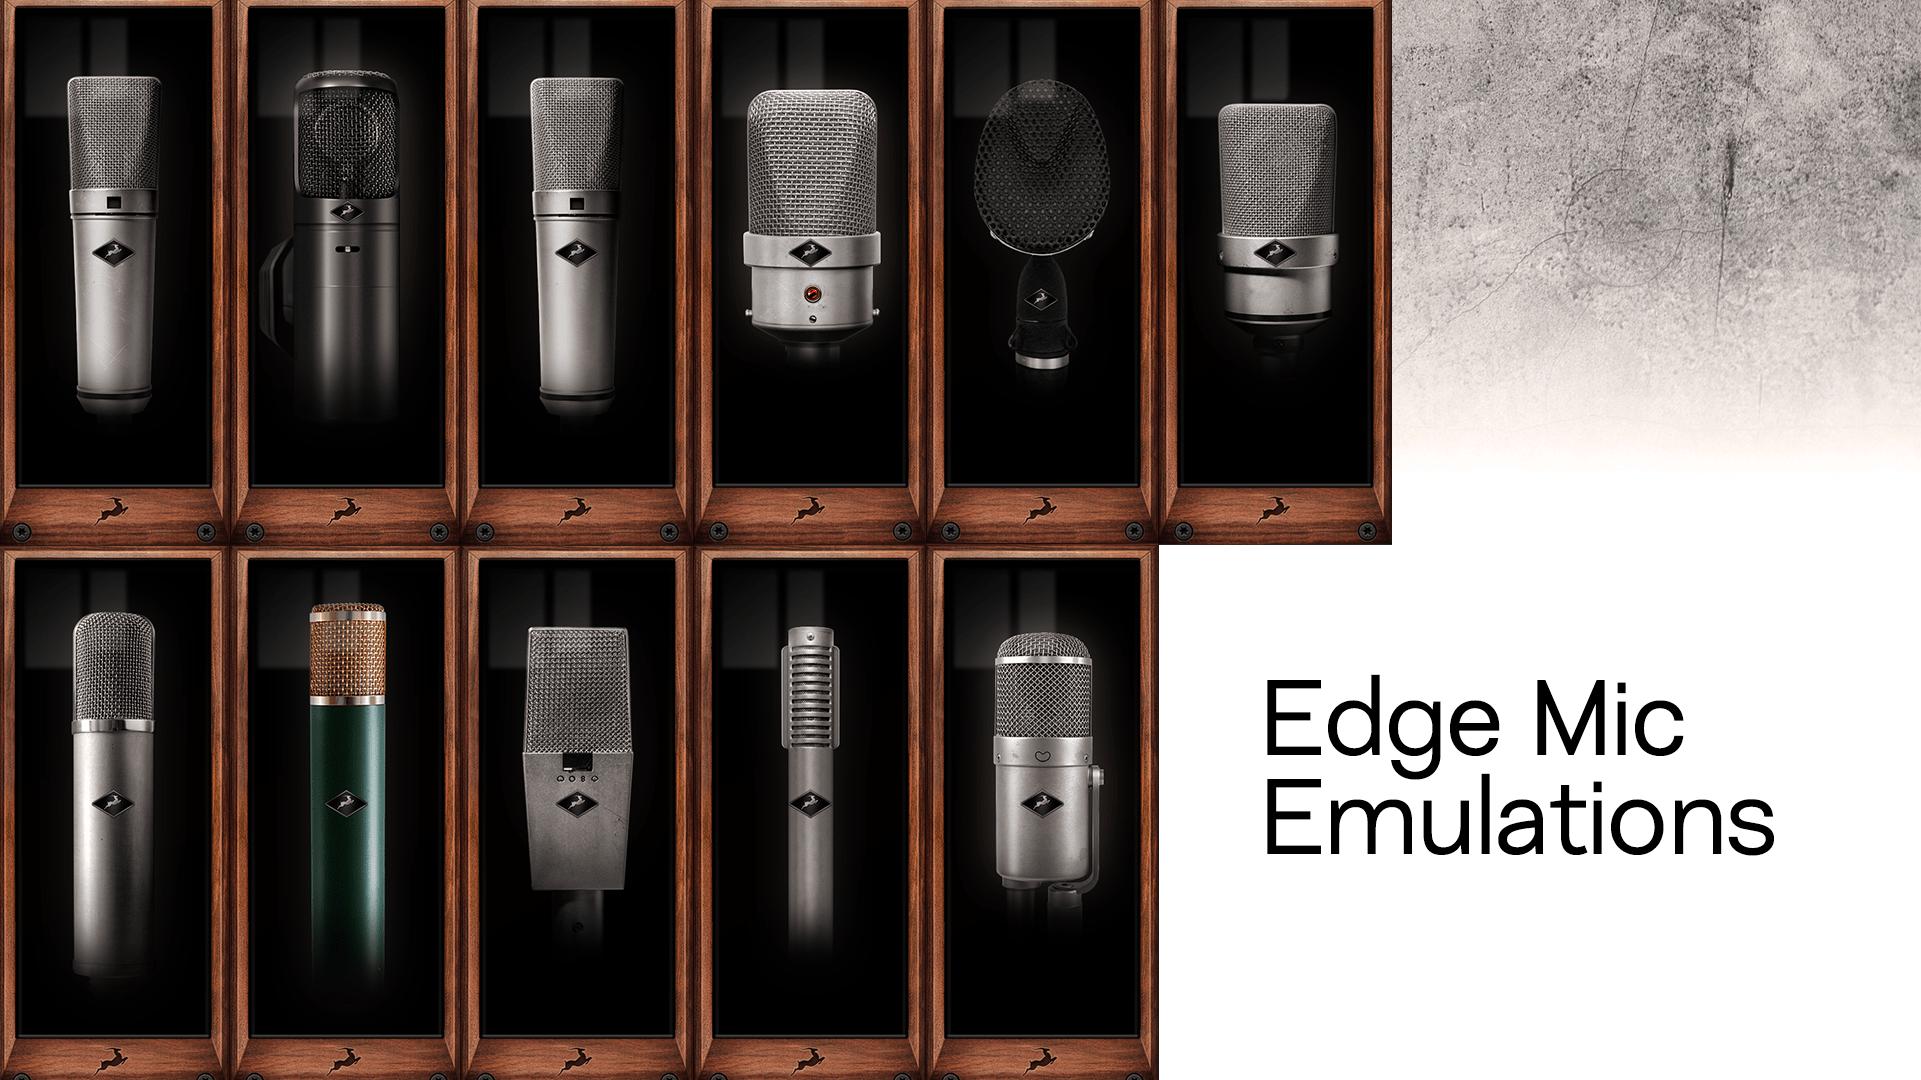 Edge Mic Emulations